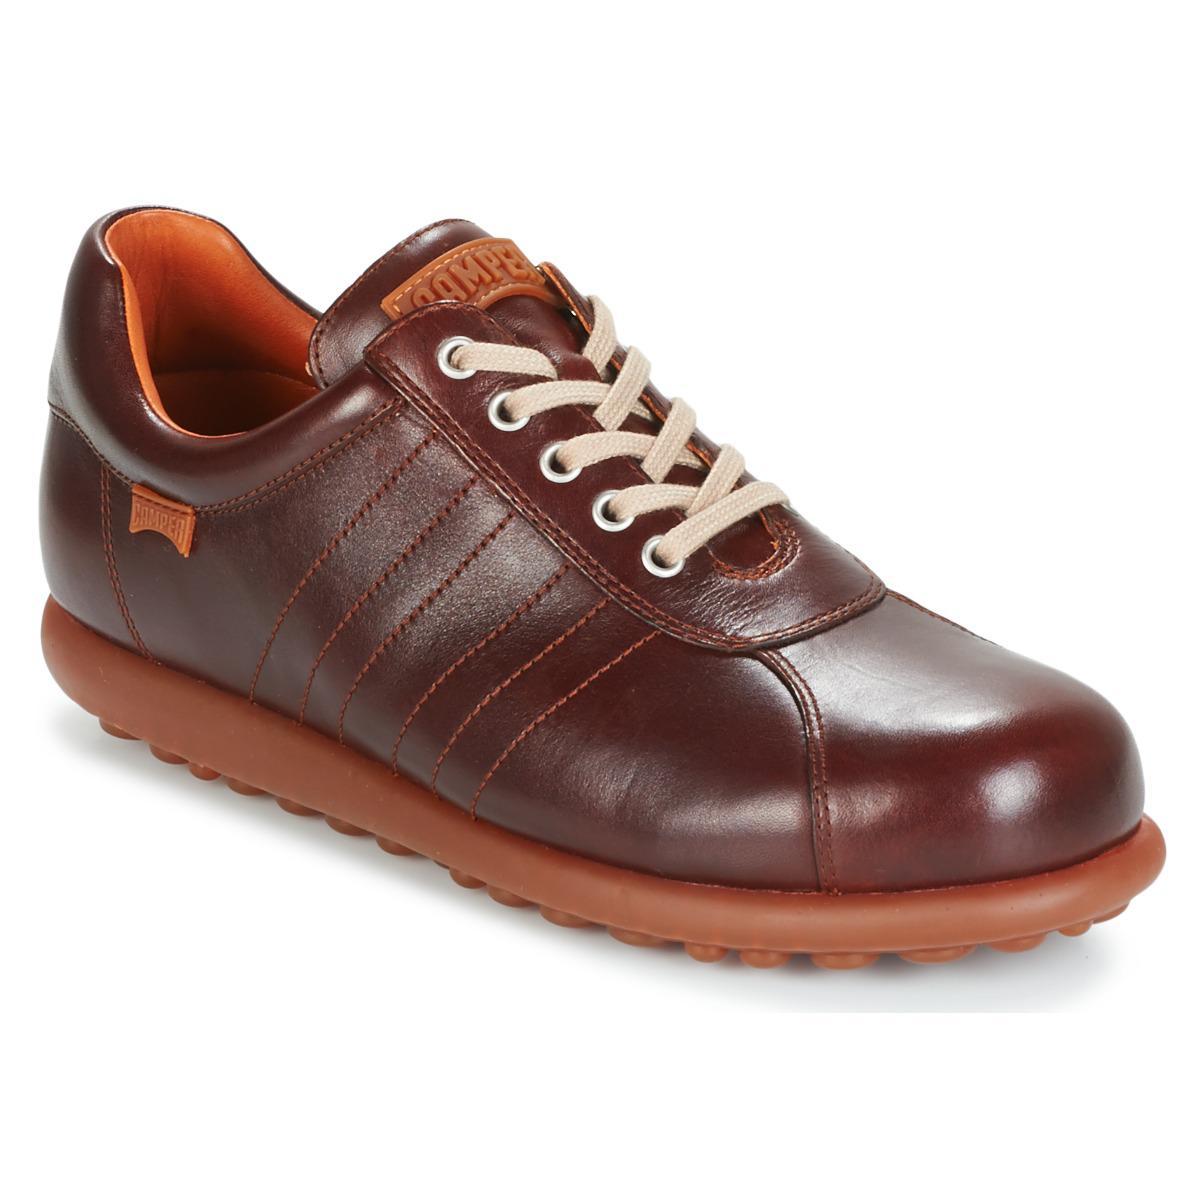 Camper Pelotas Ariel Casual Shoes in Brown for Men - Lyst d192bd2f5d5